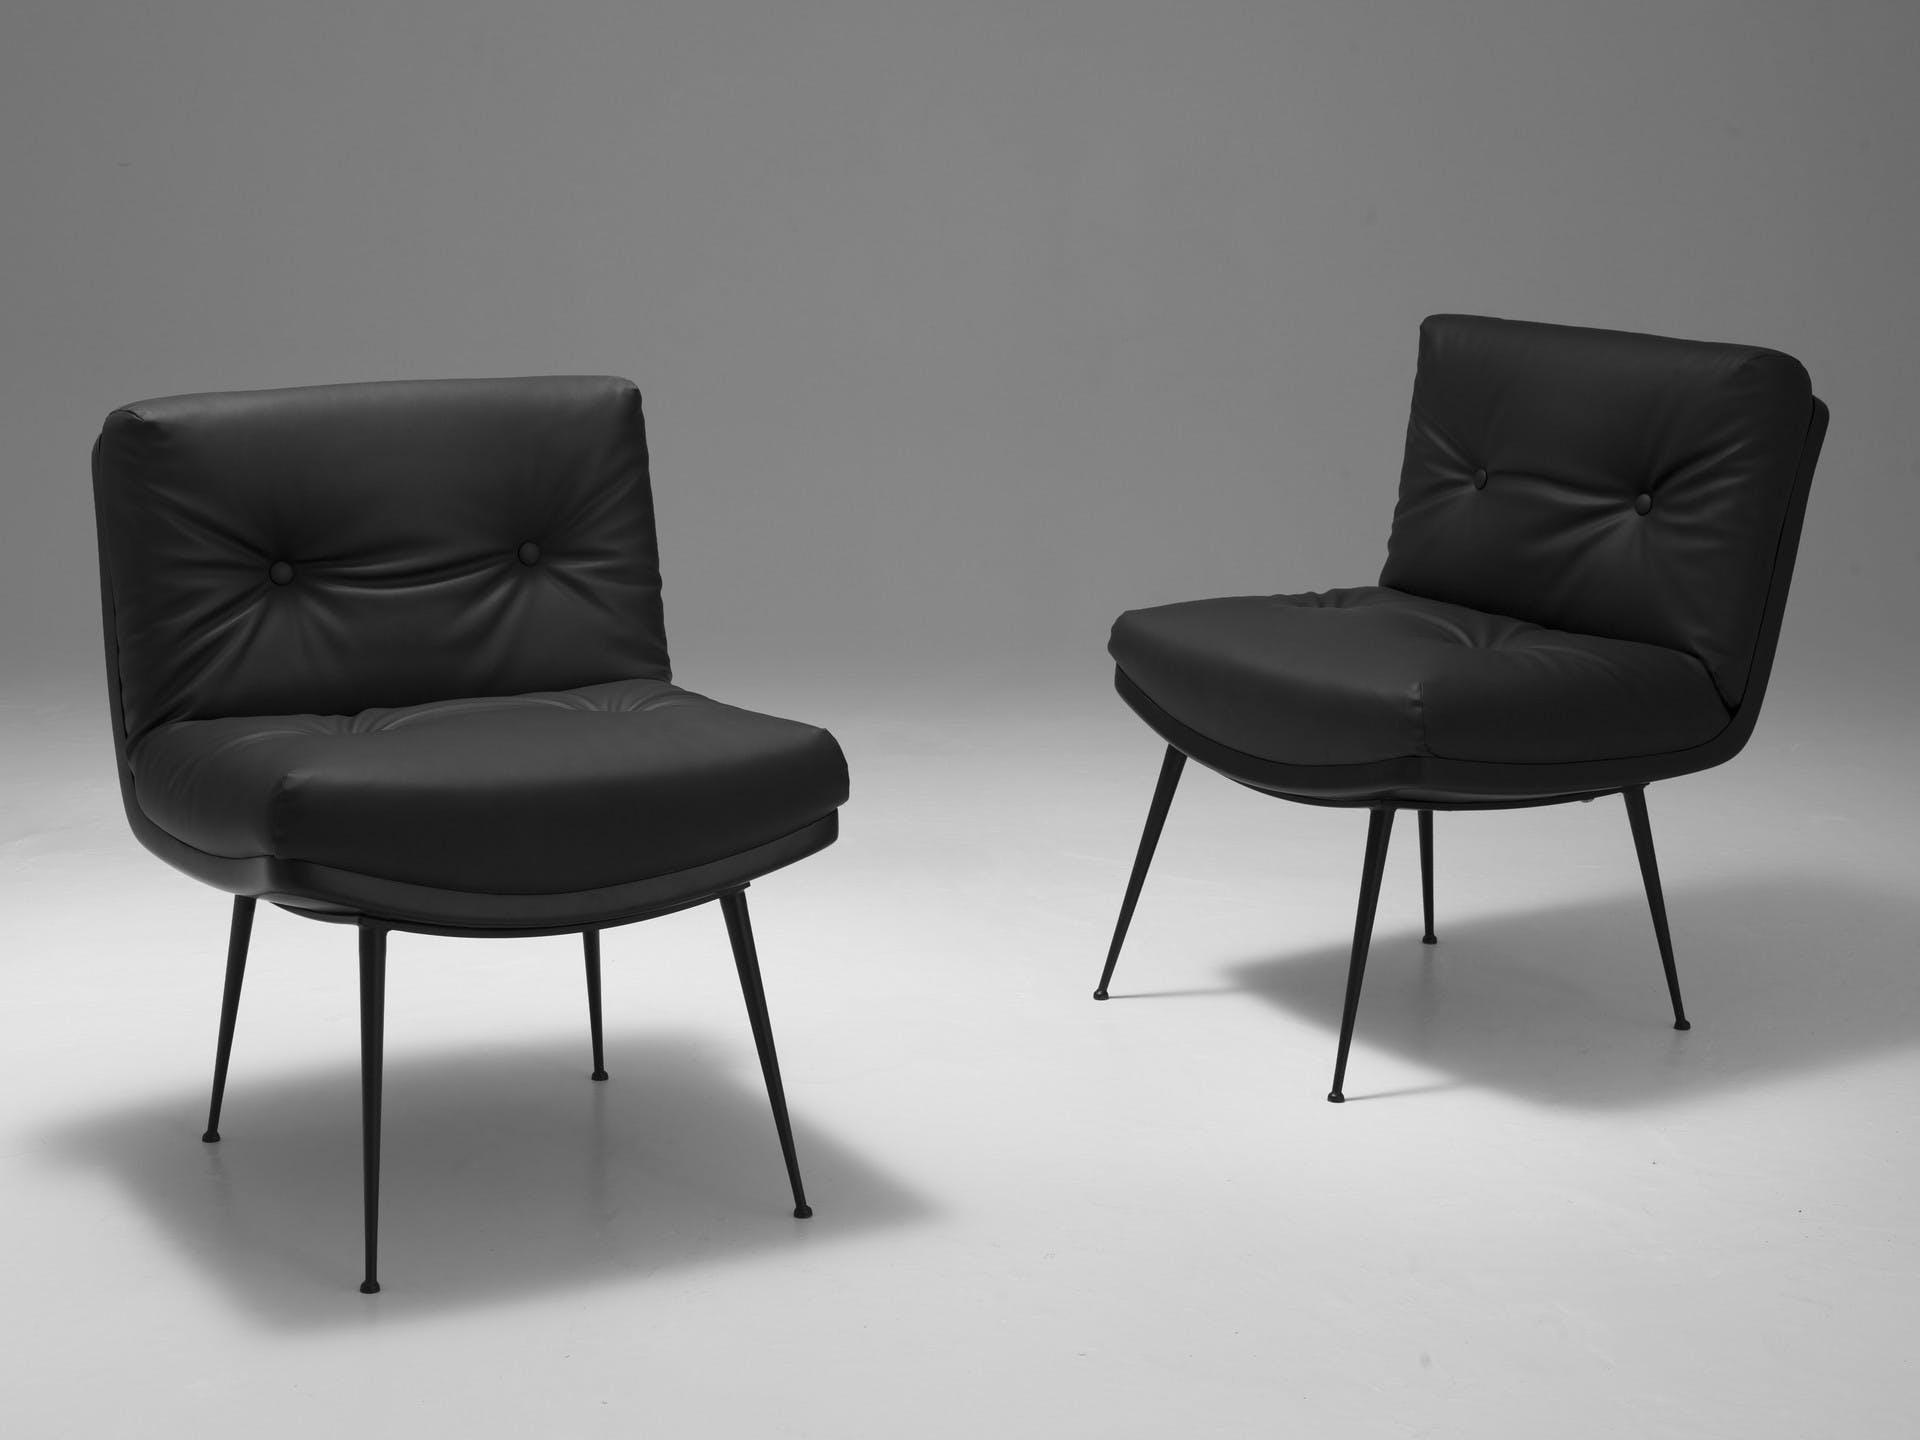 Chris Chair 1 Imperfetto Lab Haute Living